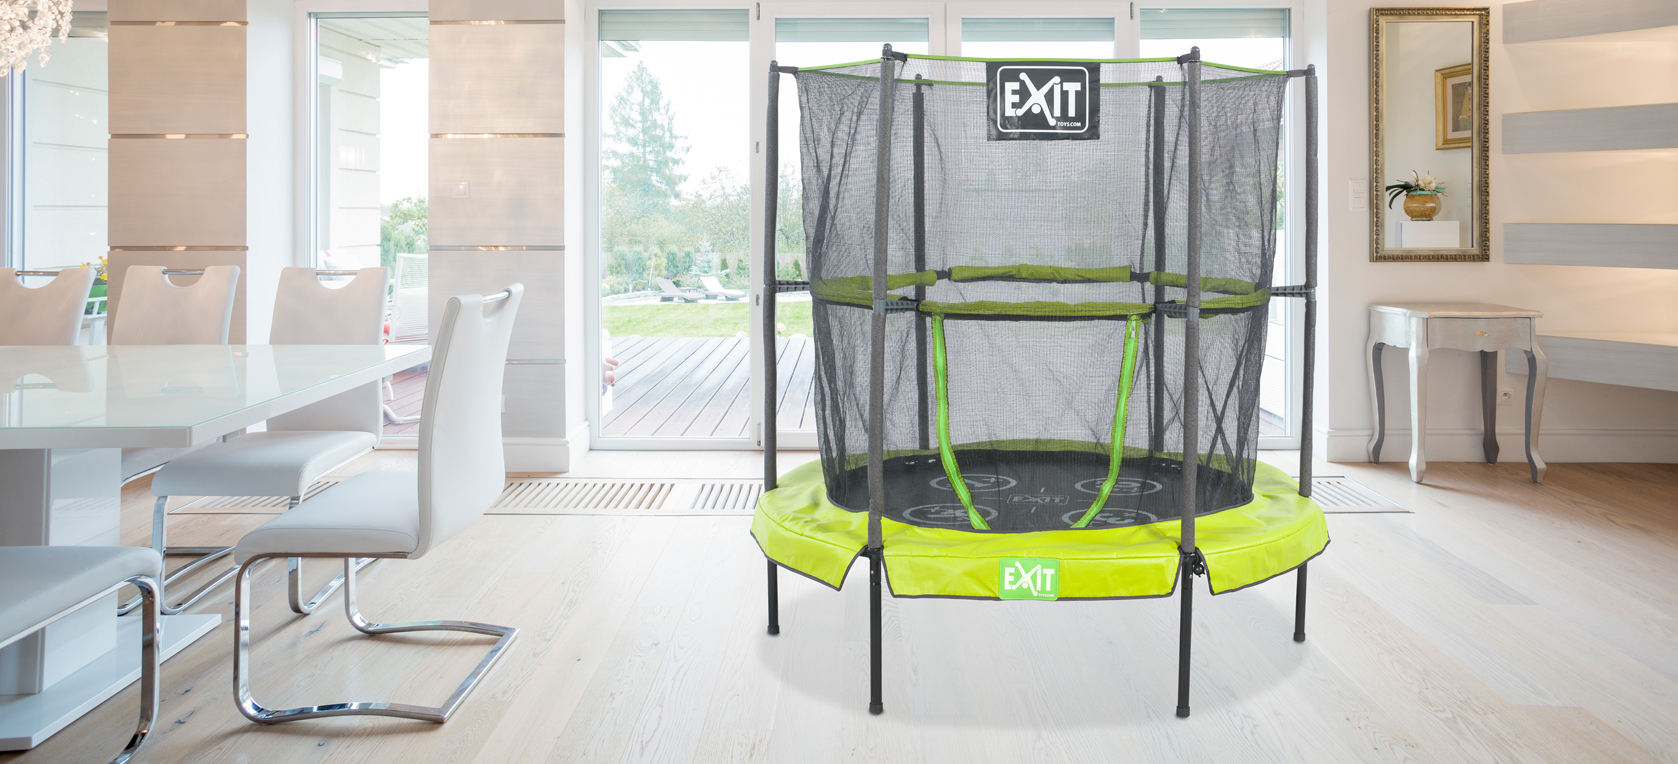 indoor trampolin f r kids exit bounzy minitrampolin. Black Bedroom Furniture Sets. Home Design Ideas